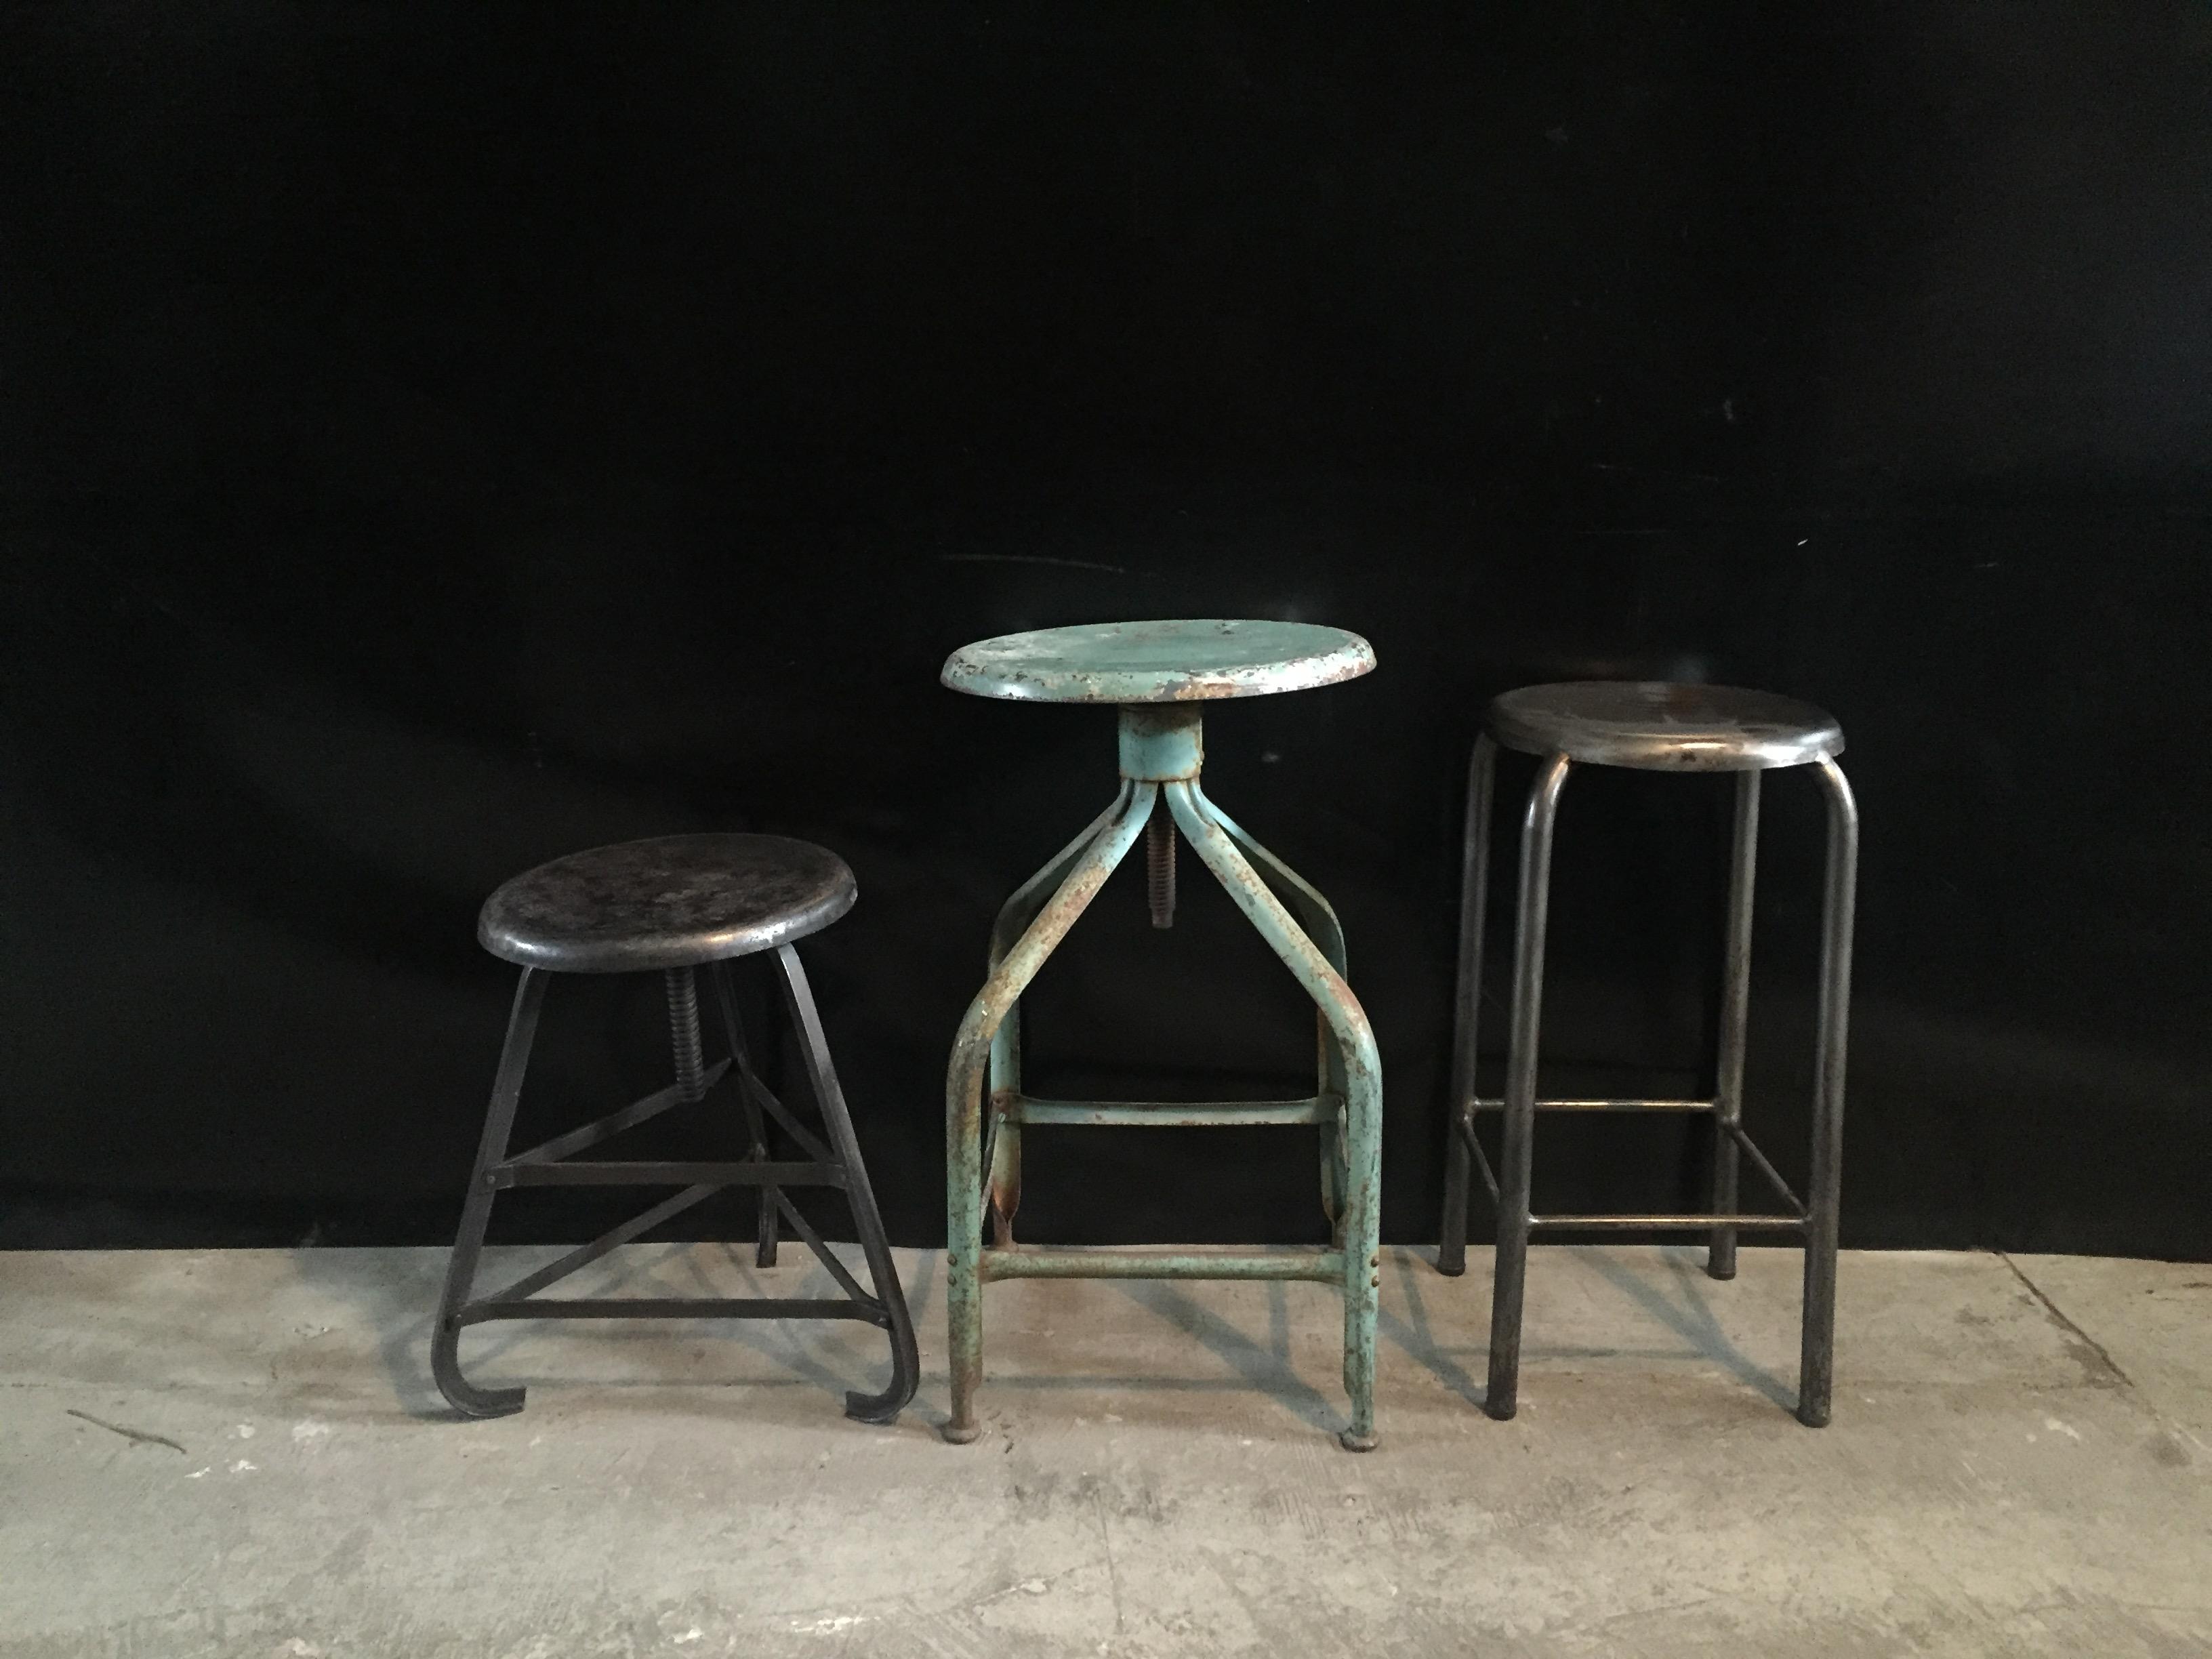 Crysqd sedia ferro battuto vintage bar sedia da pranzo in